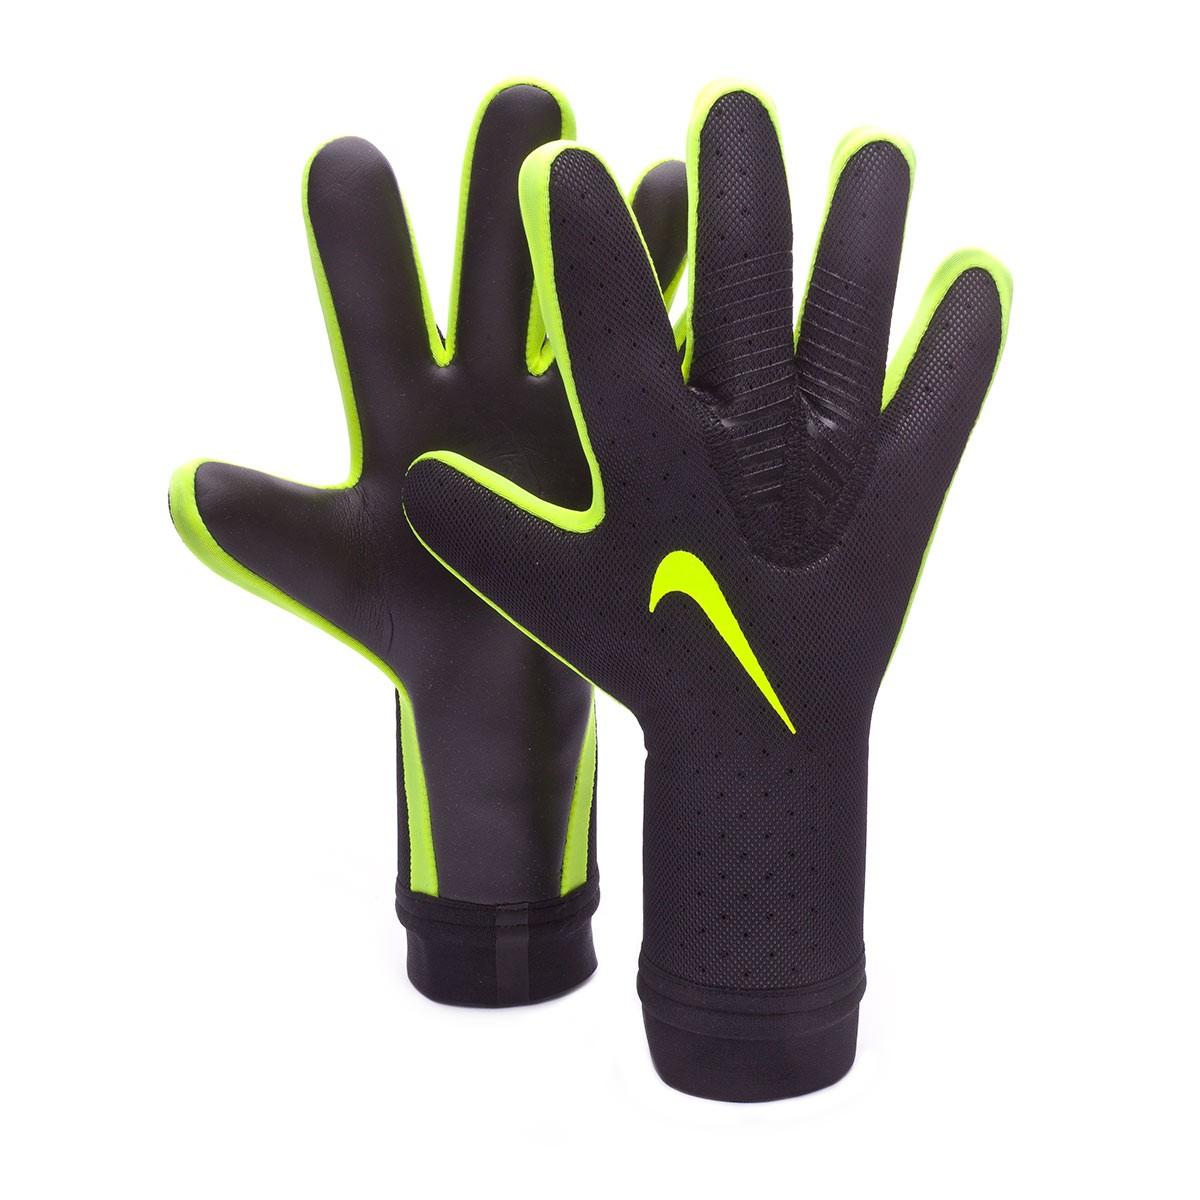 f743bff92 Glove Nike Mercurial Touch Elite Promo Black-Volt - Football store Fútbol  Emotion